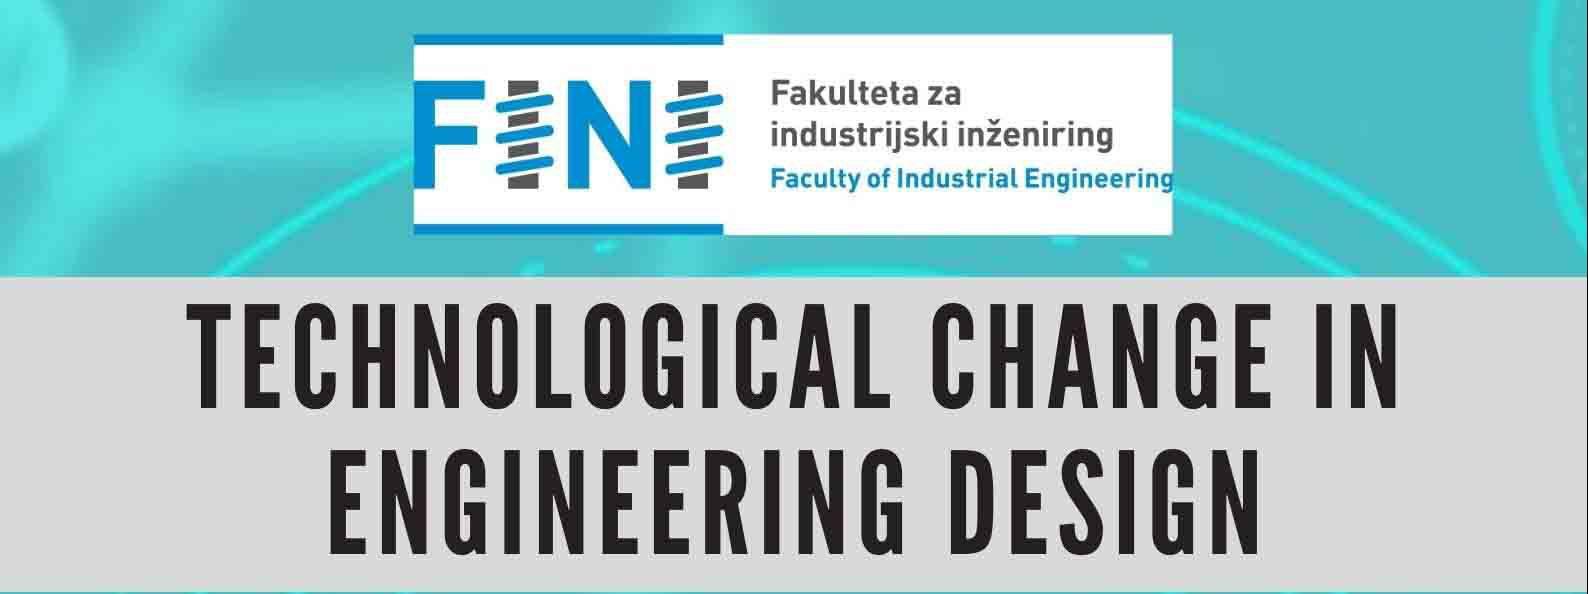 Webinar Technological Change in Engineering Design